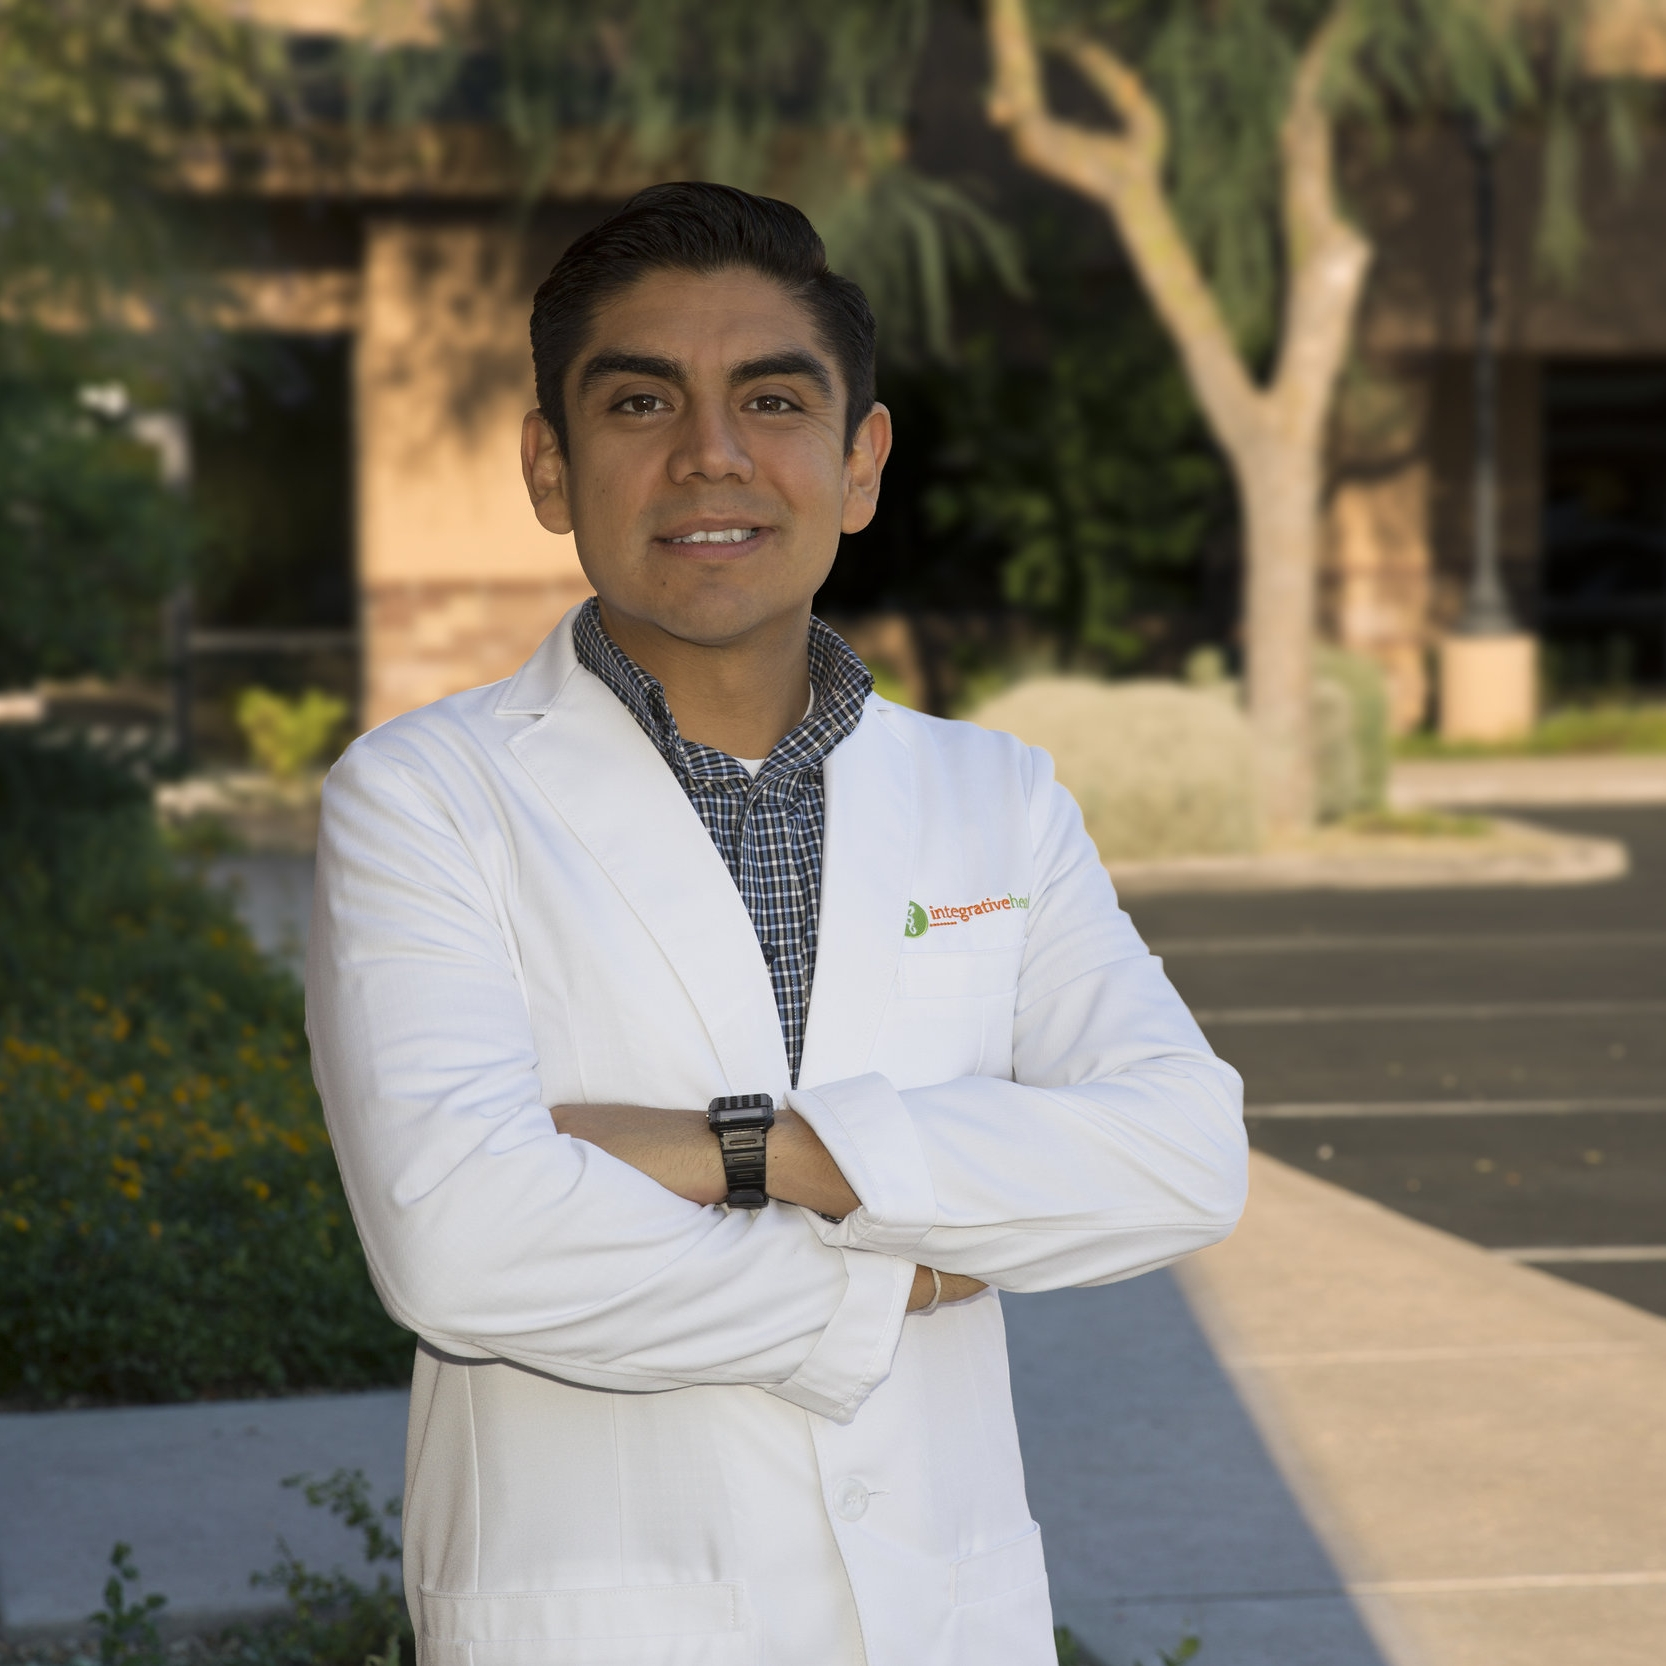 Visit Dr. Ruiz's Office Website!